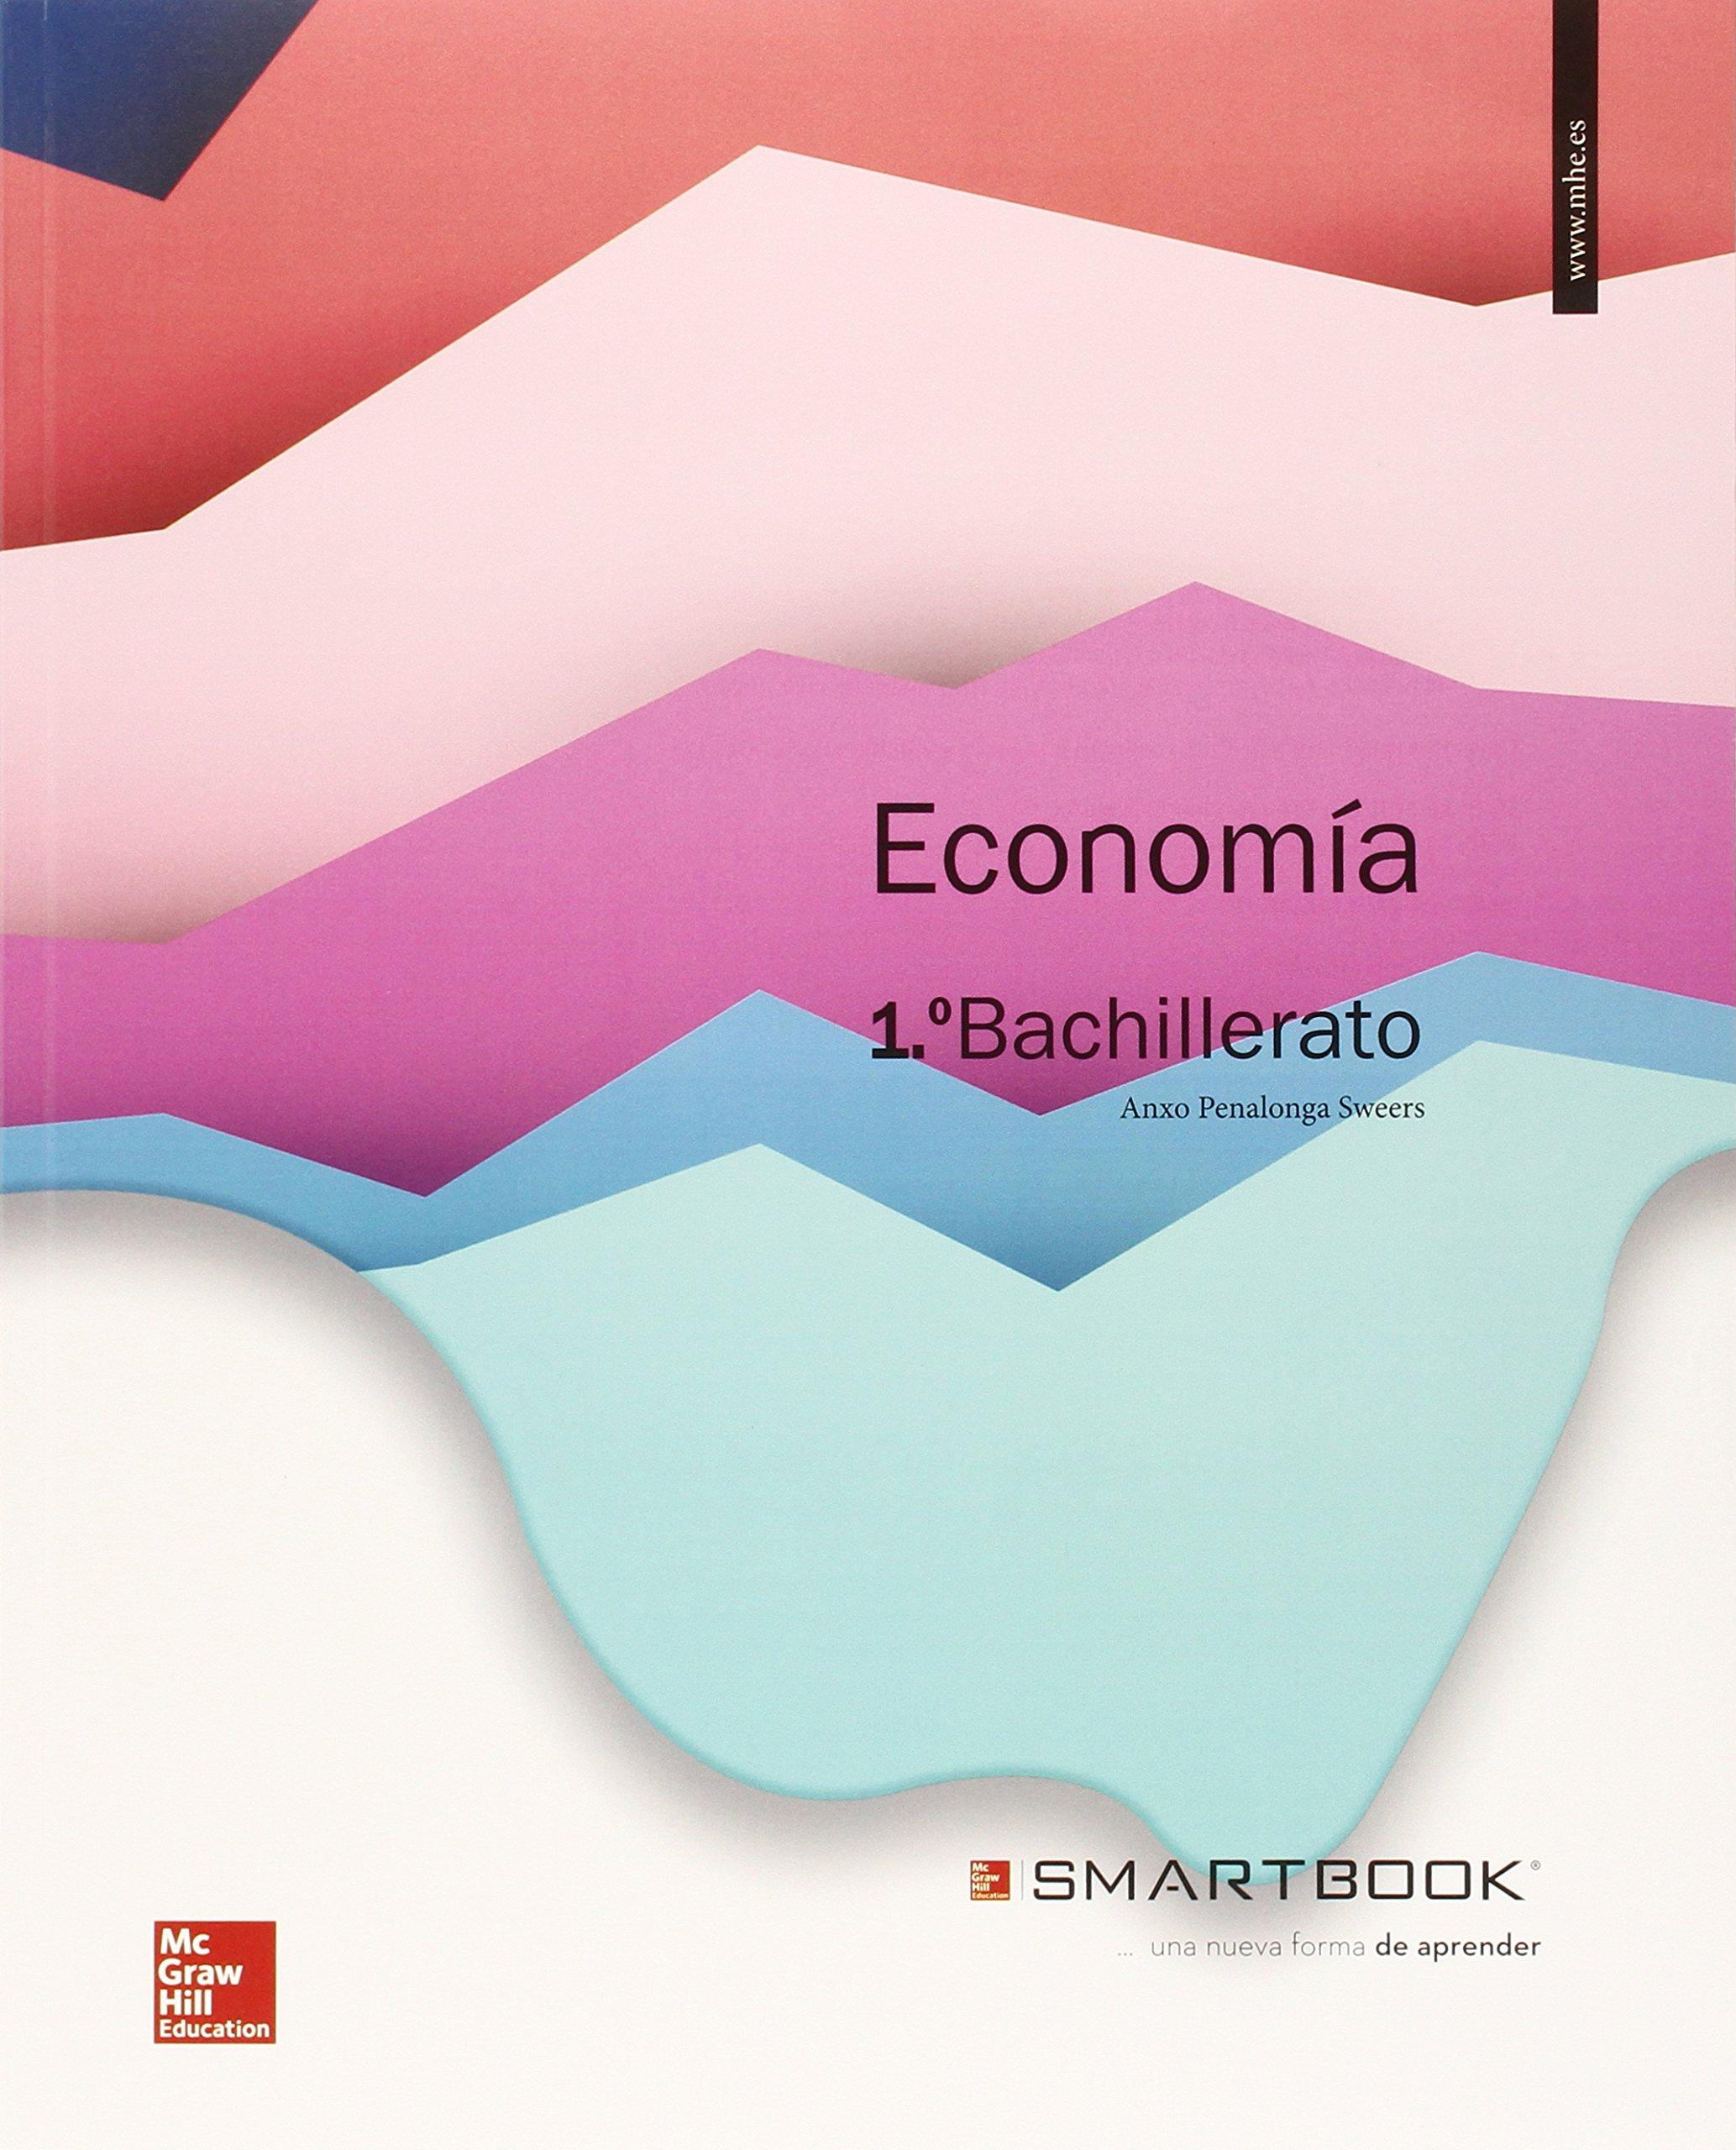 Economía 1. Penalonga - Edición 2015 (+ Smartbook) - 9788448195960 Tapa blanda – 15 jun 2015 Anxo Penalonga 8448195965 Economics Educational material